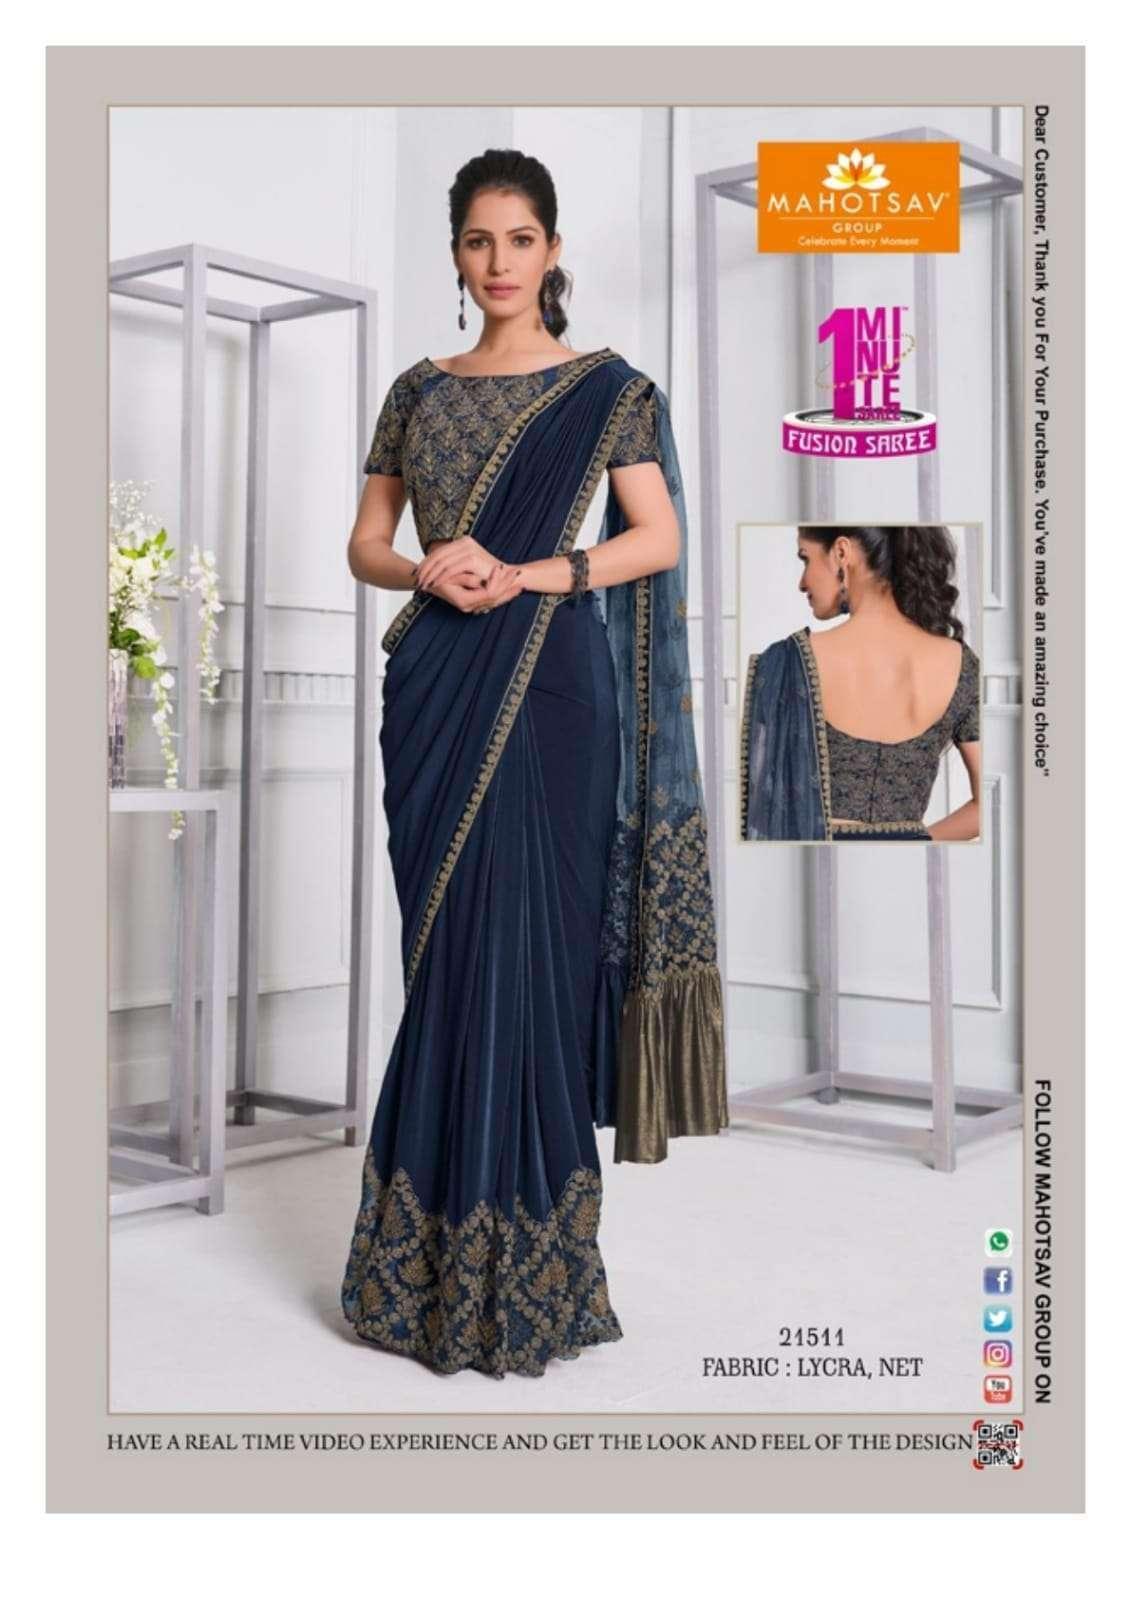 Mahotsav Moh Manthan Izzara 21501 To 215018 Series Fancy Designer Sarees Collection 21511